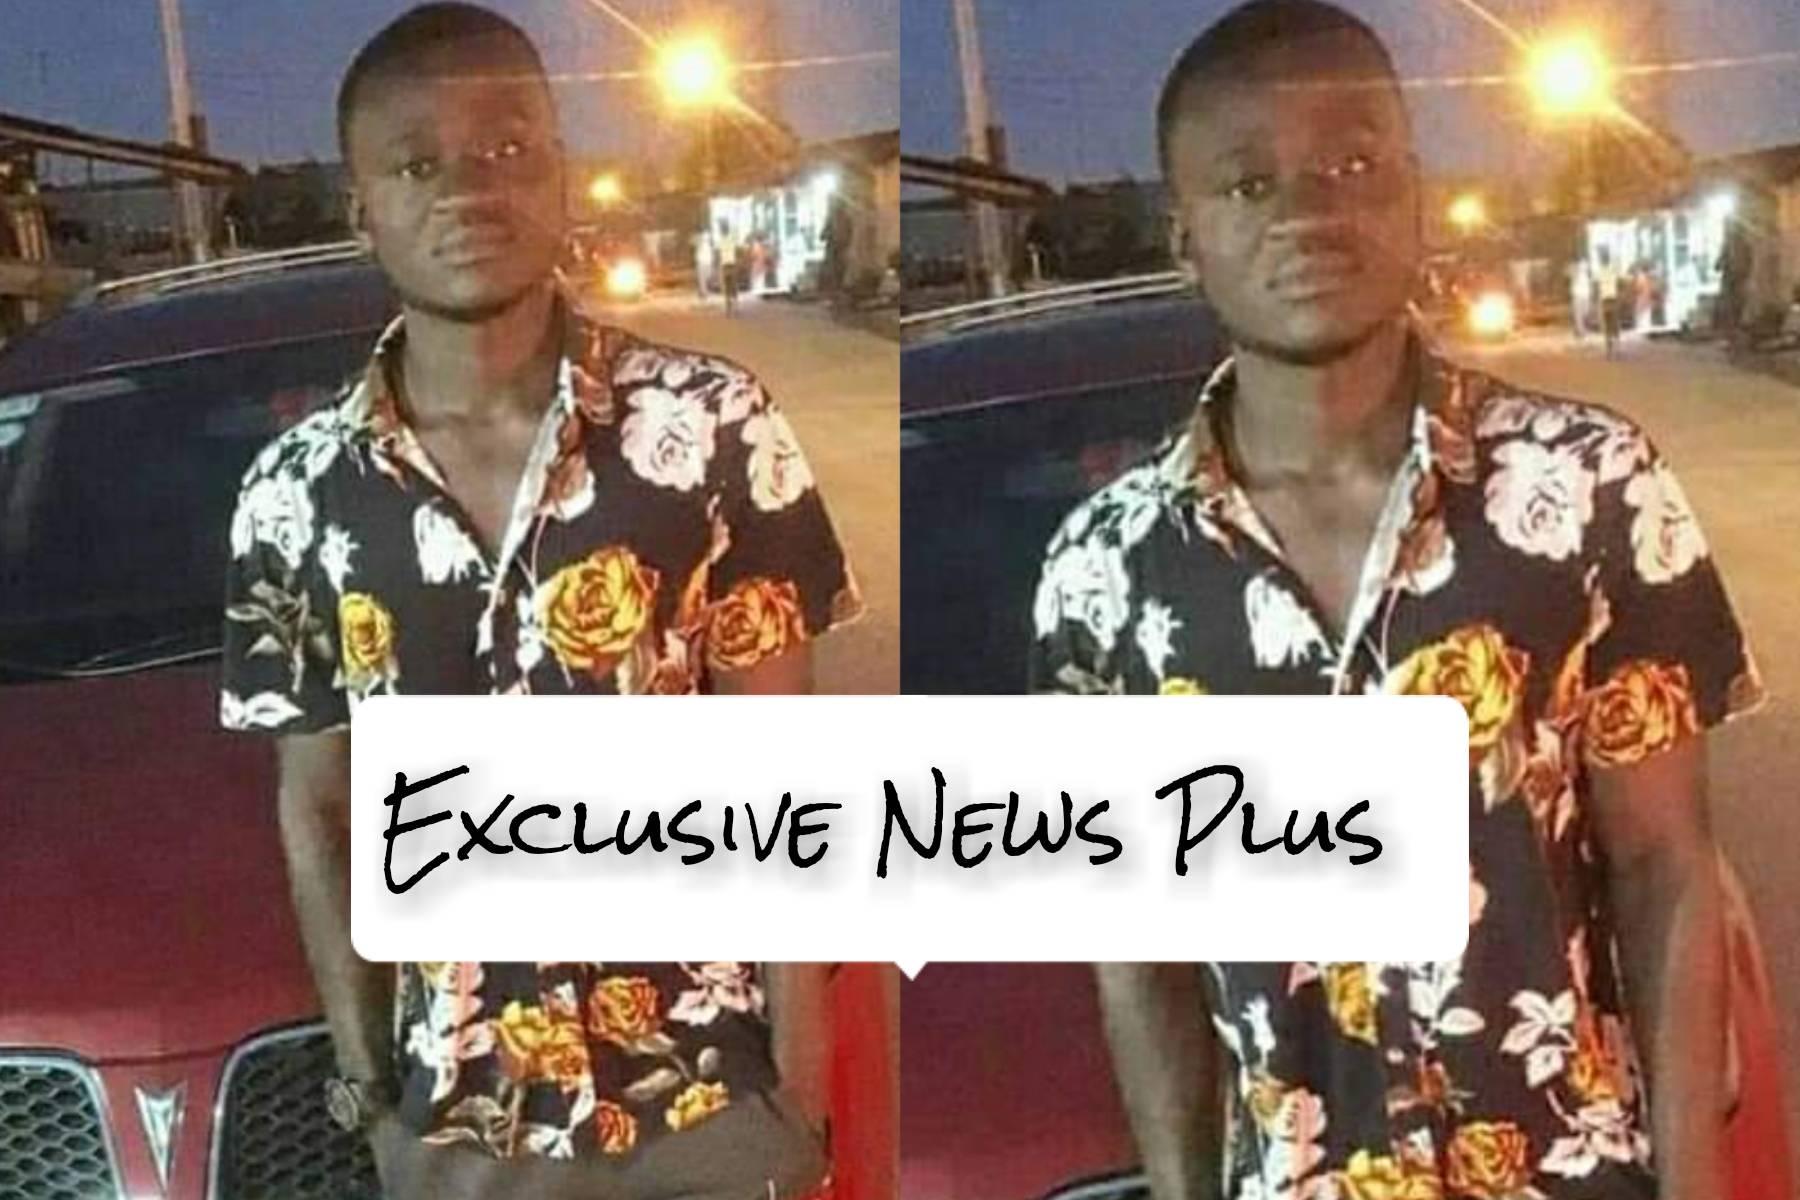 32-Year-Old Man Shot Dead